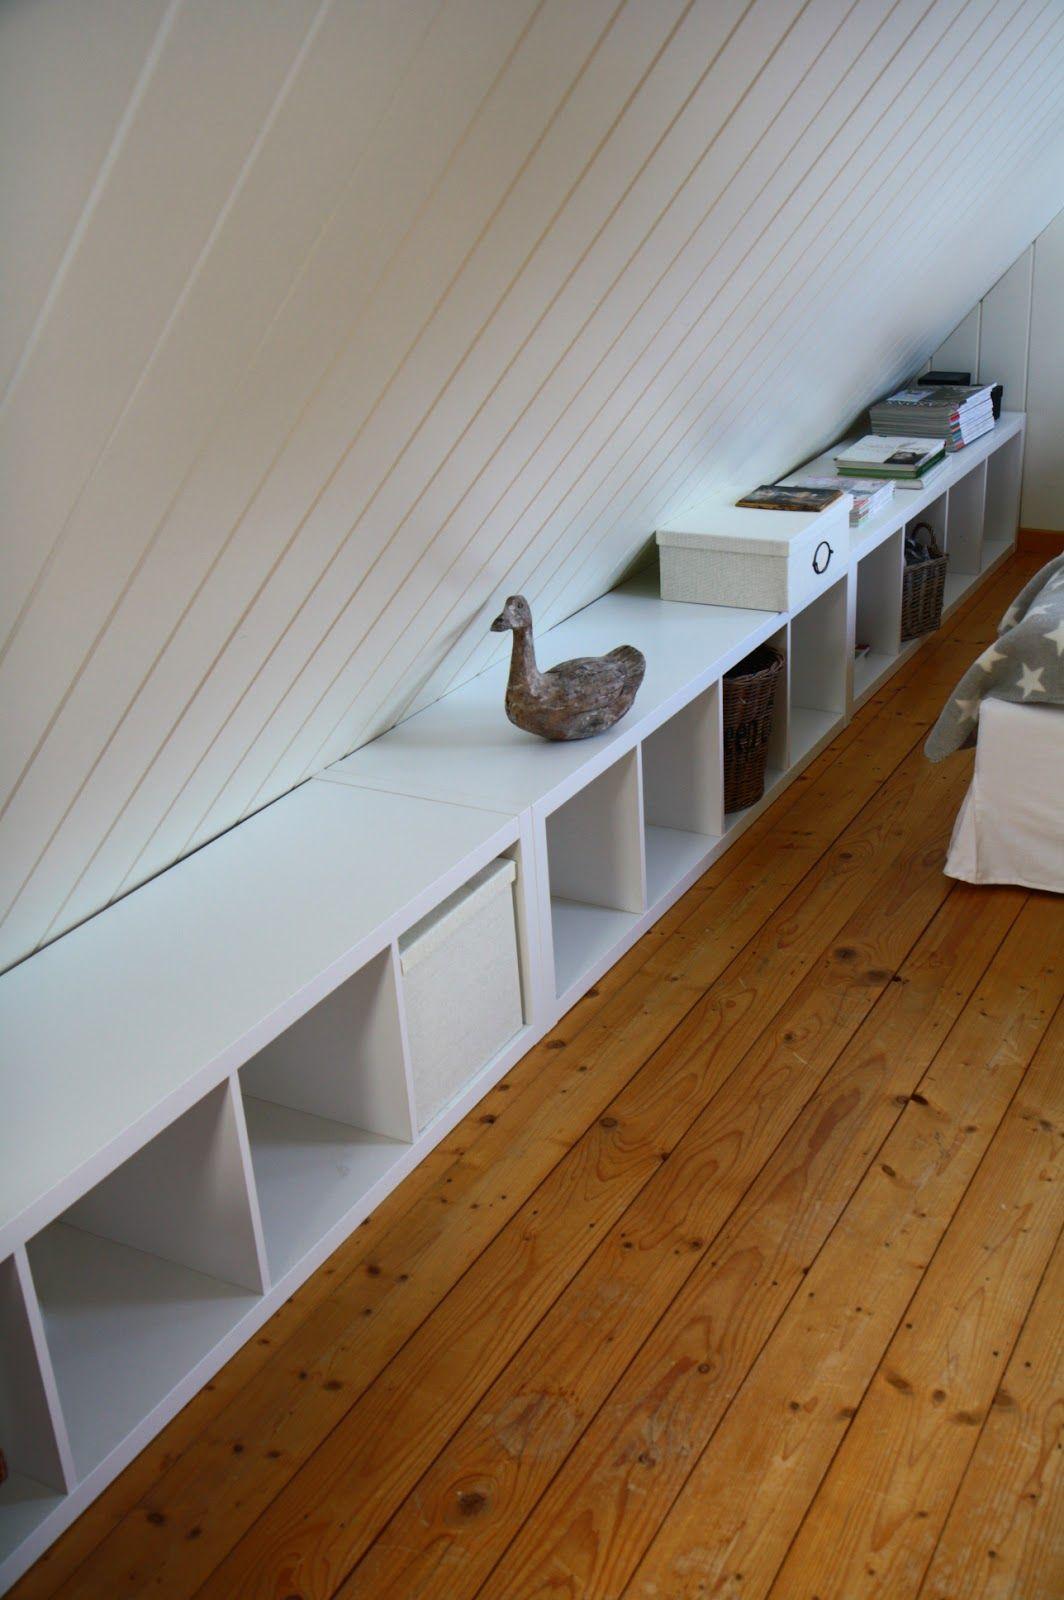 Möbel-Flohmarkt | dachbodenausbau ° attic ° zolderkamer ...